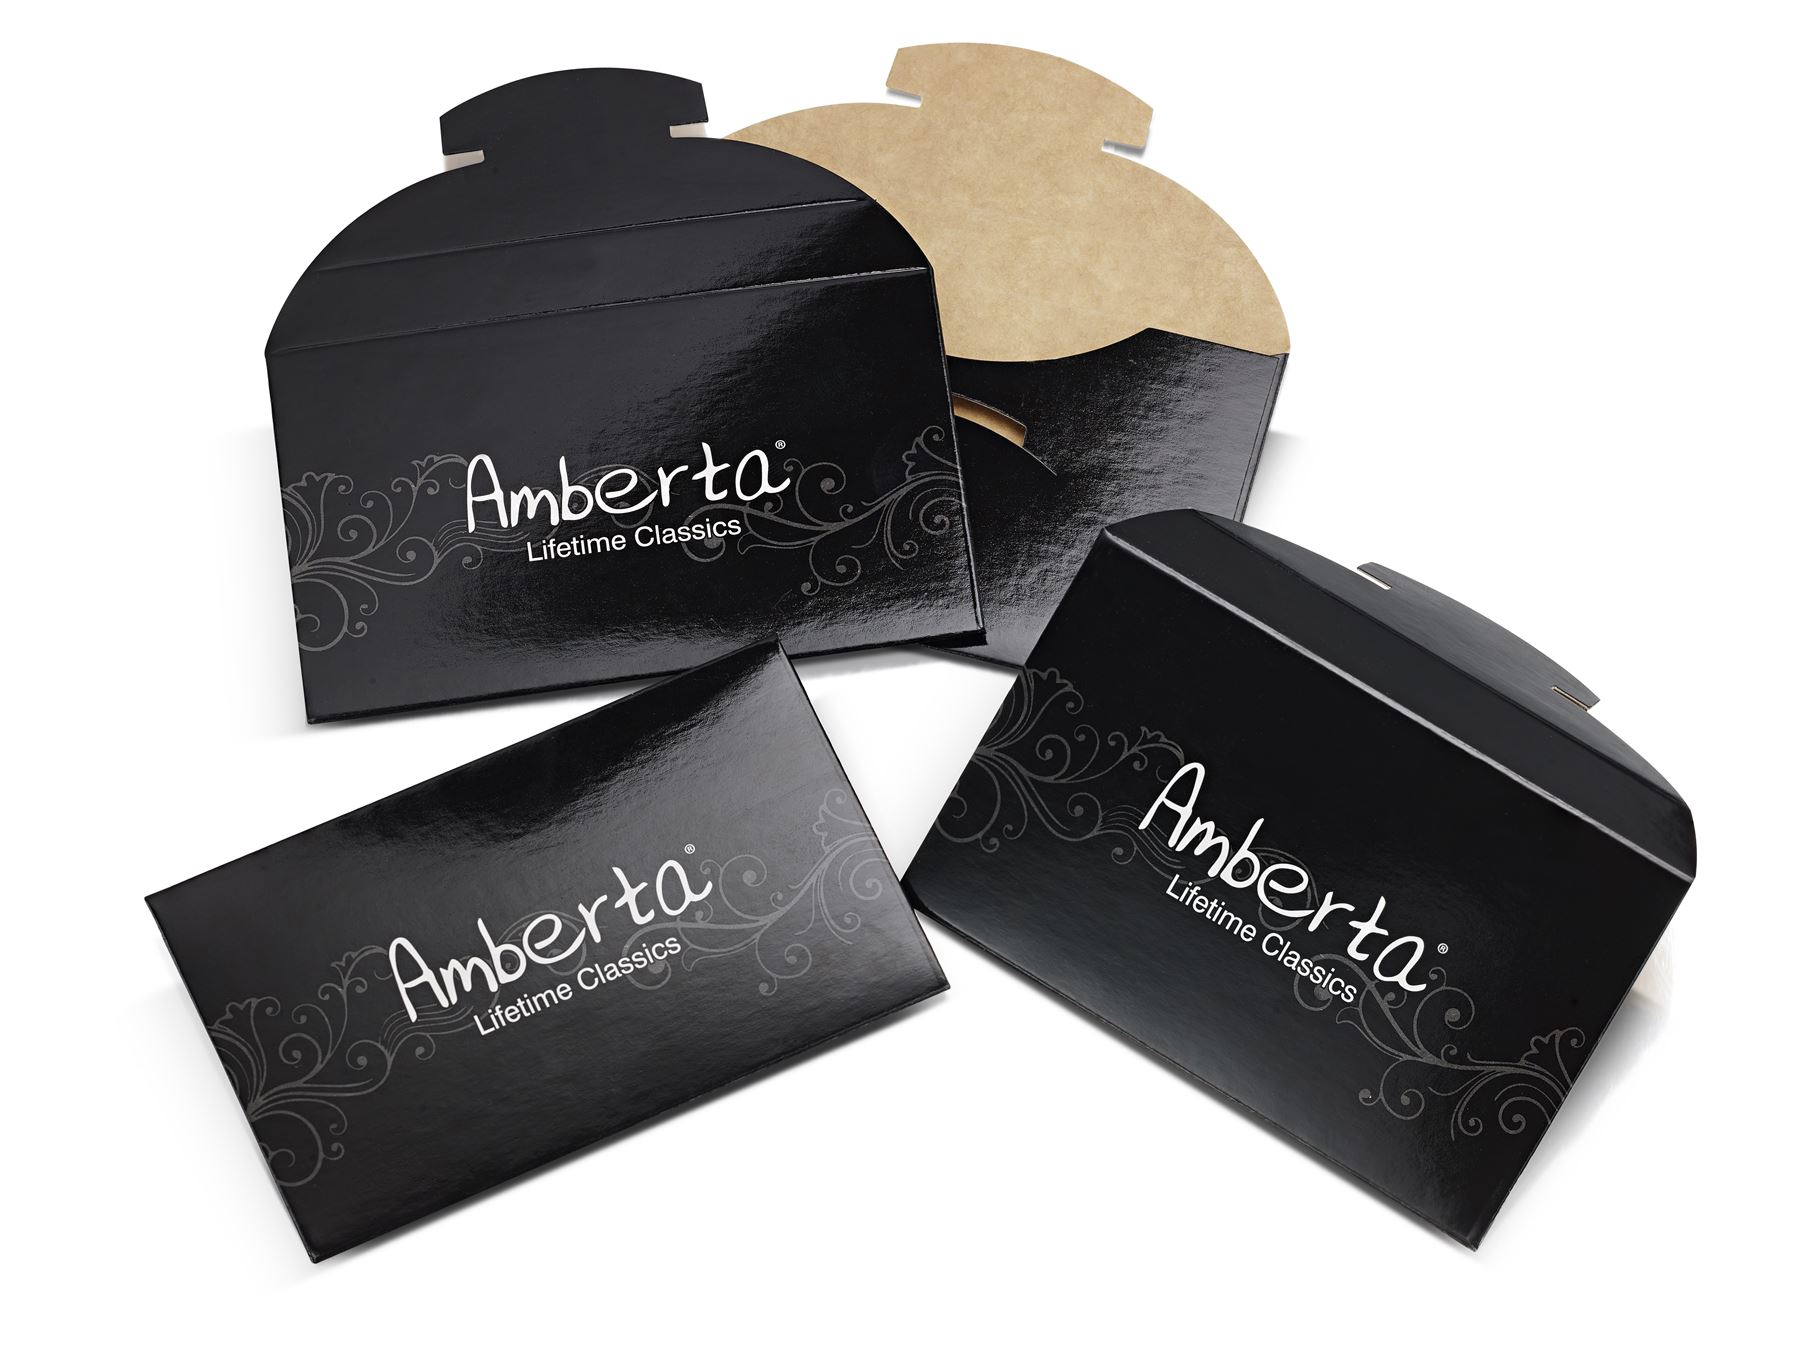 Amberta-Jewelry-925-Sterling-Silver-Adjustable-Bracelet-Italian-Bangle-for-Women miniature 76